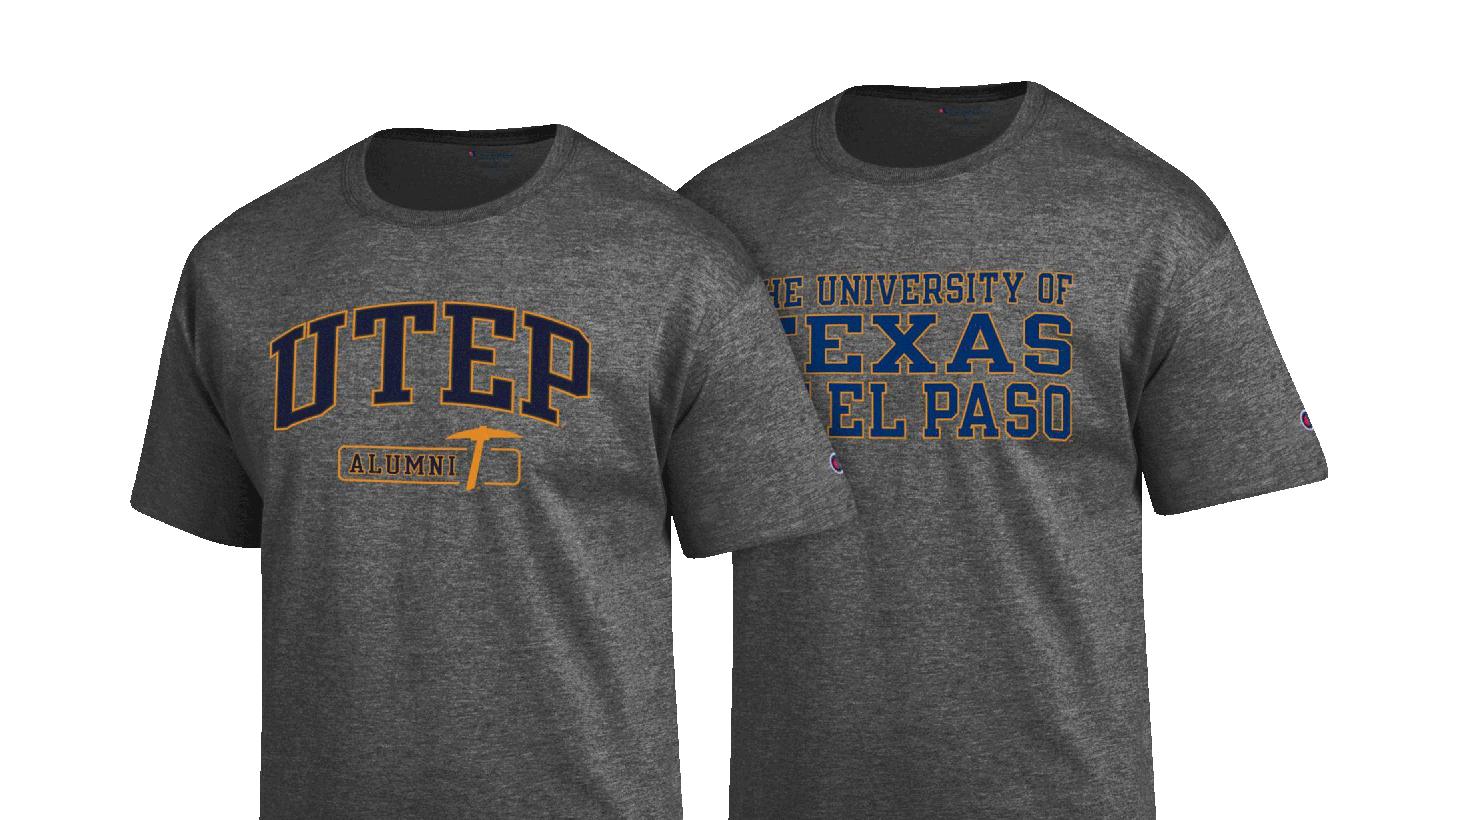 6bae3abb8a3 University of Texas El Paso Bookstore Apparel, Merchandise, & Gifts